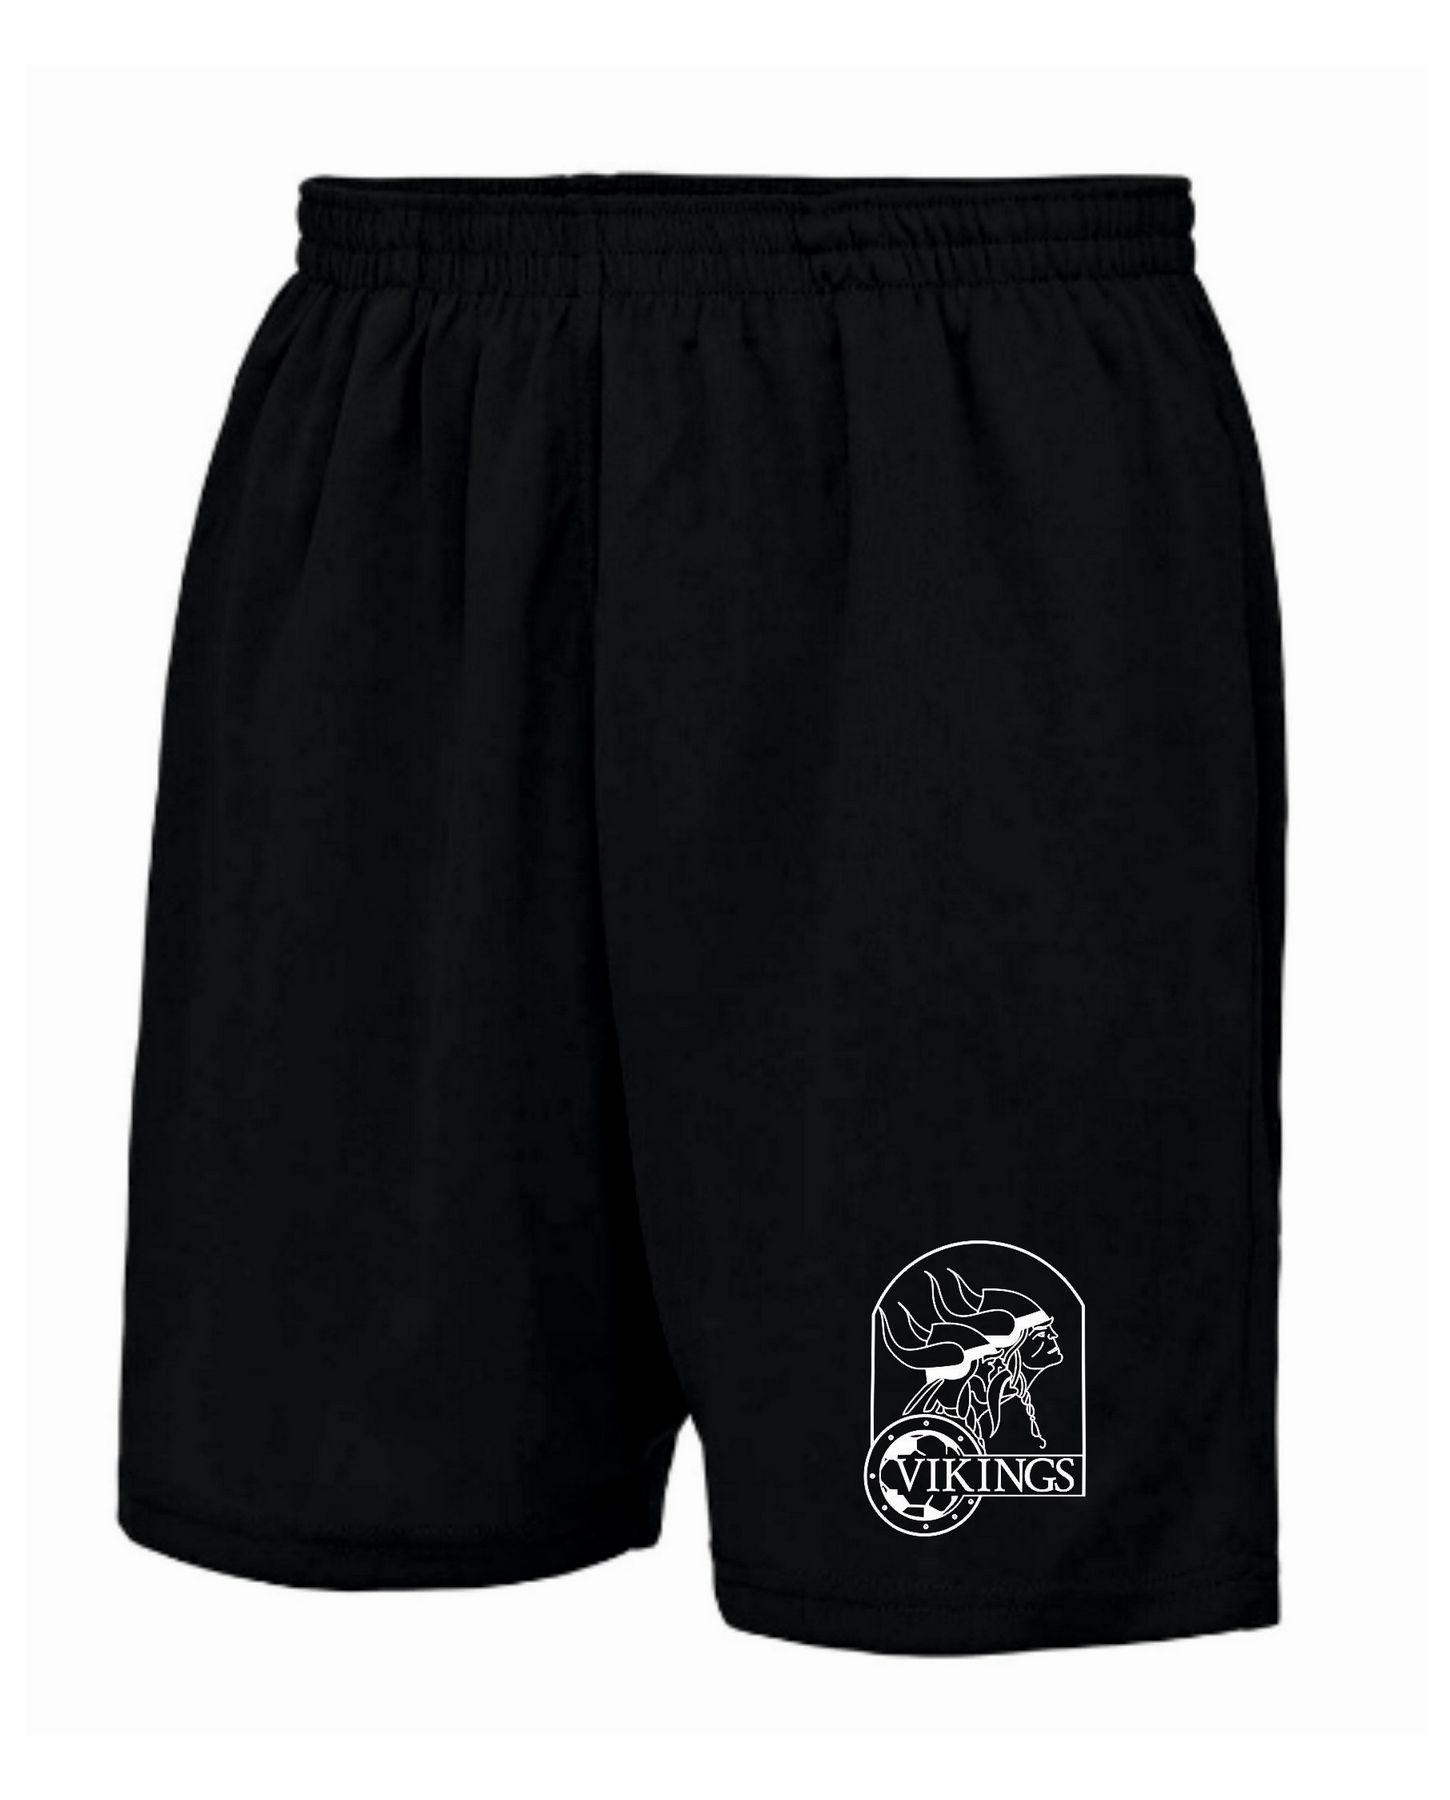 Vikings match and training shorts